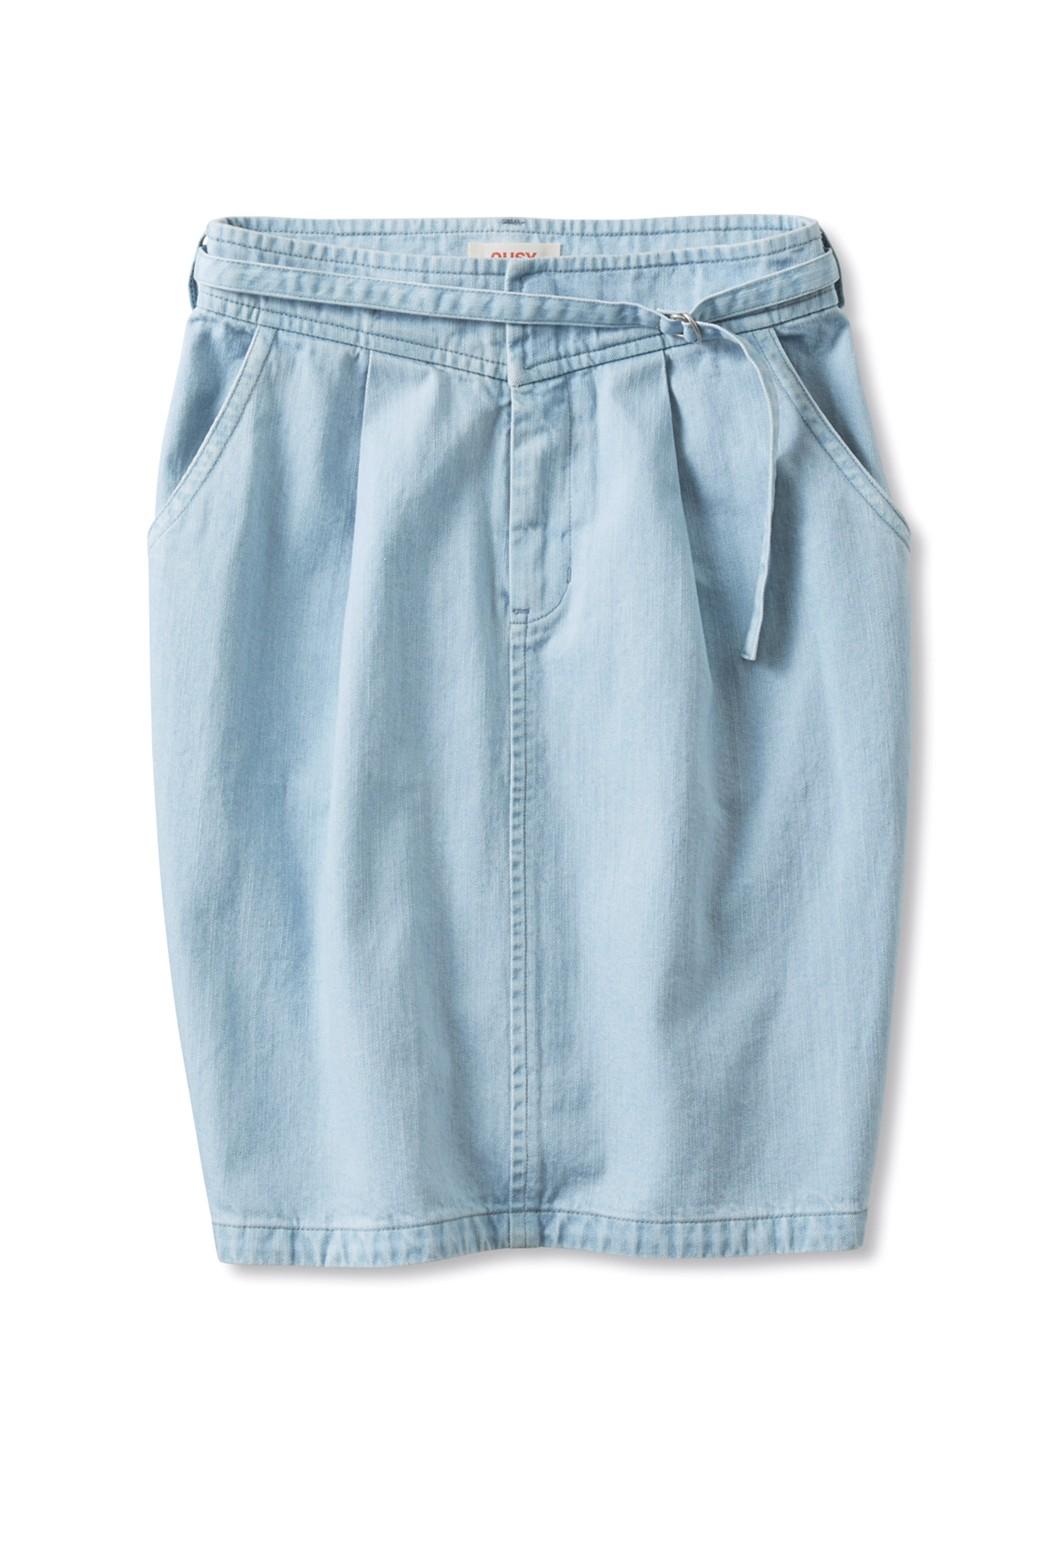 nusy こだわりタックがかわいいコクーン型デニムスカート <ライトブルー>の商品写真1